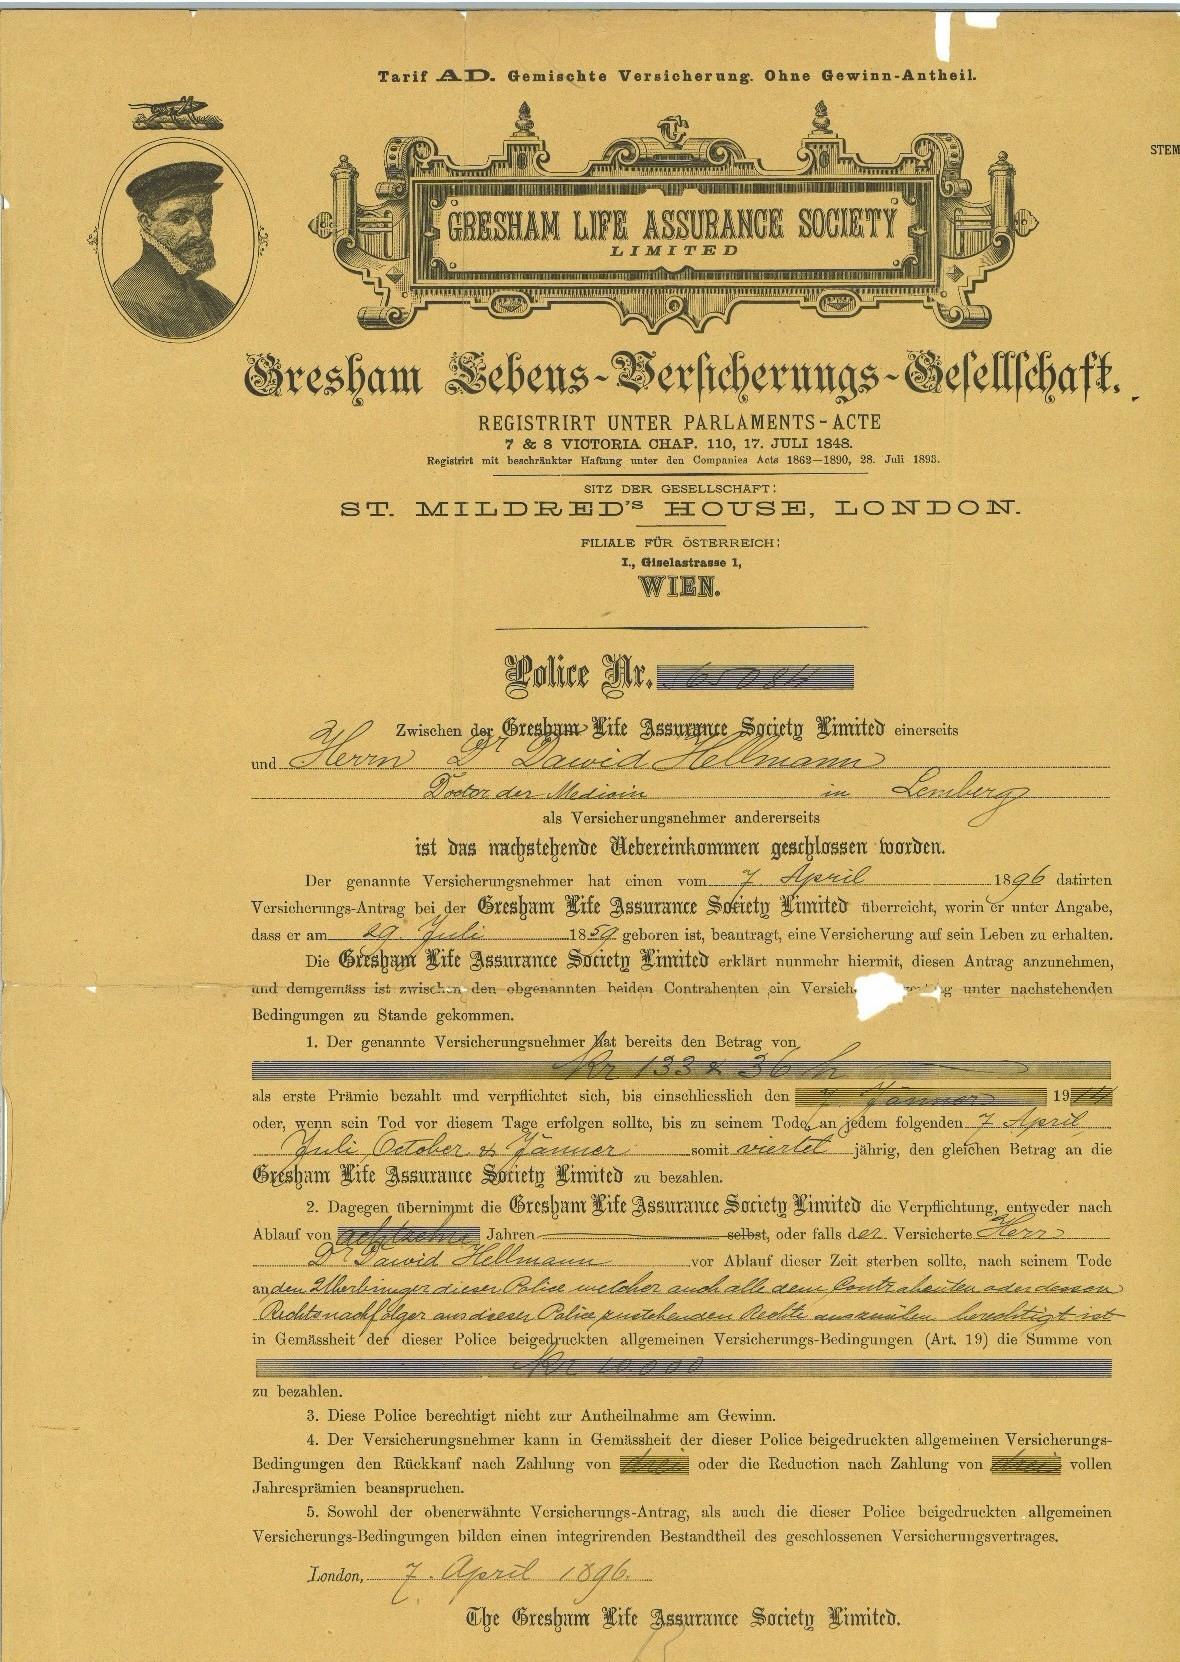 GRESHAM LIFE ASSURANCE POLISA LWÓW 1896